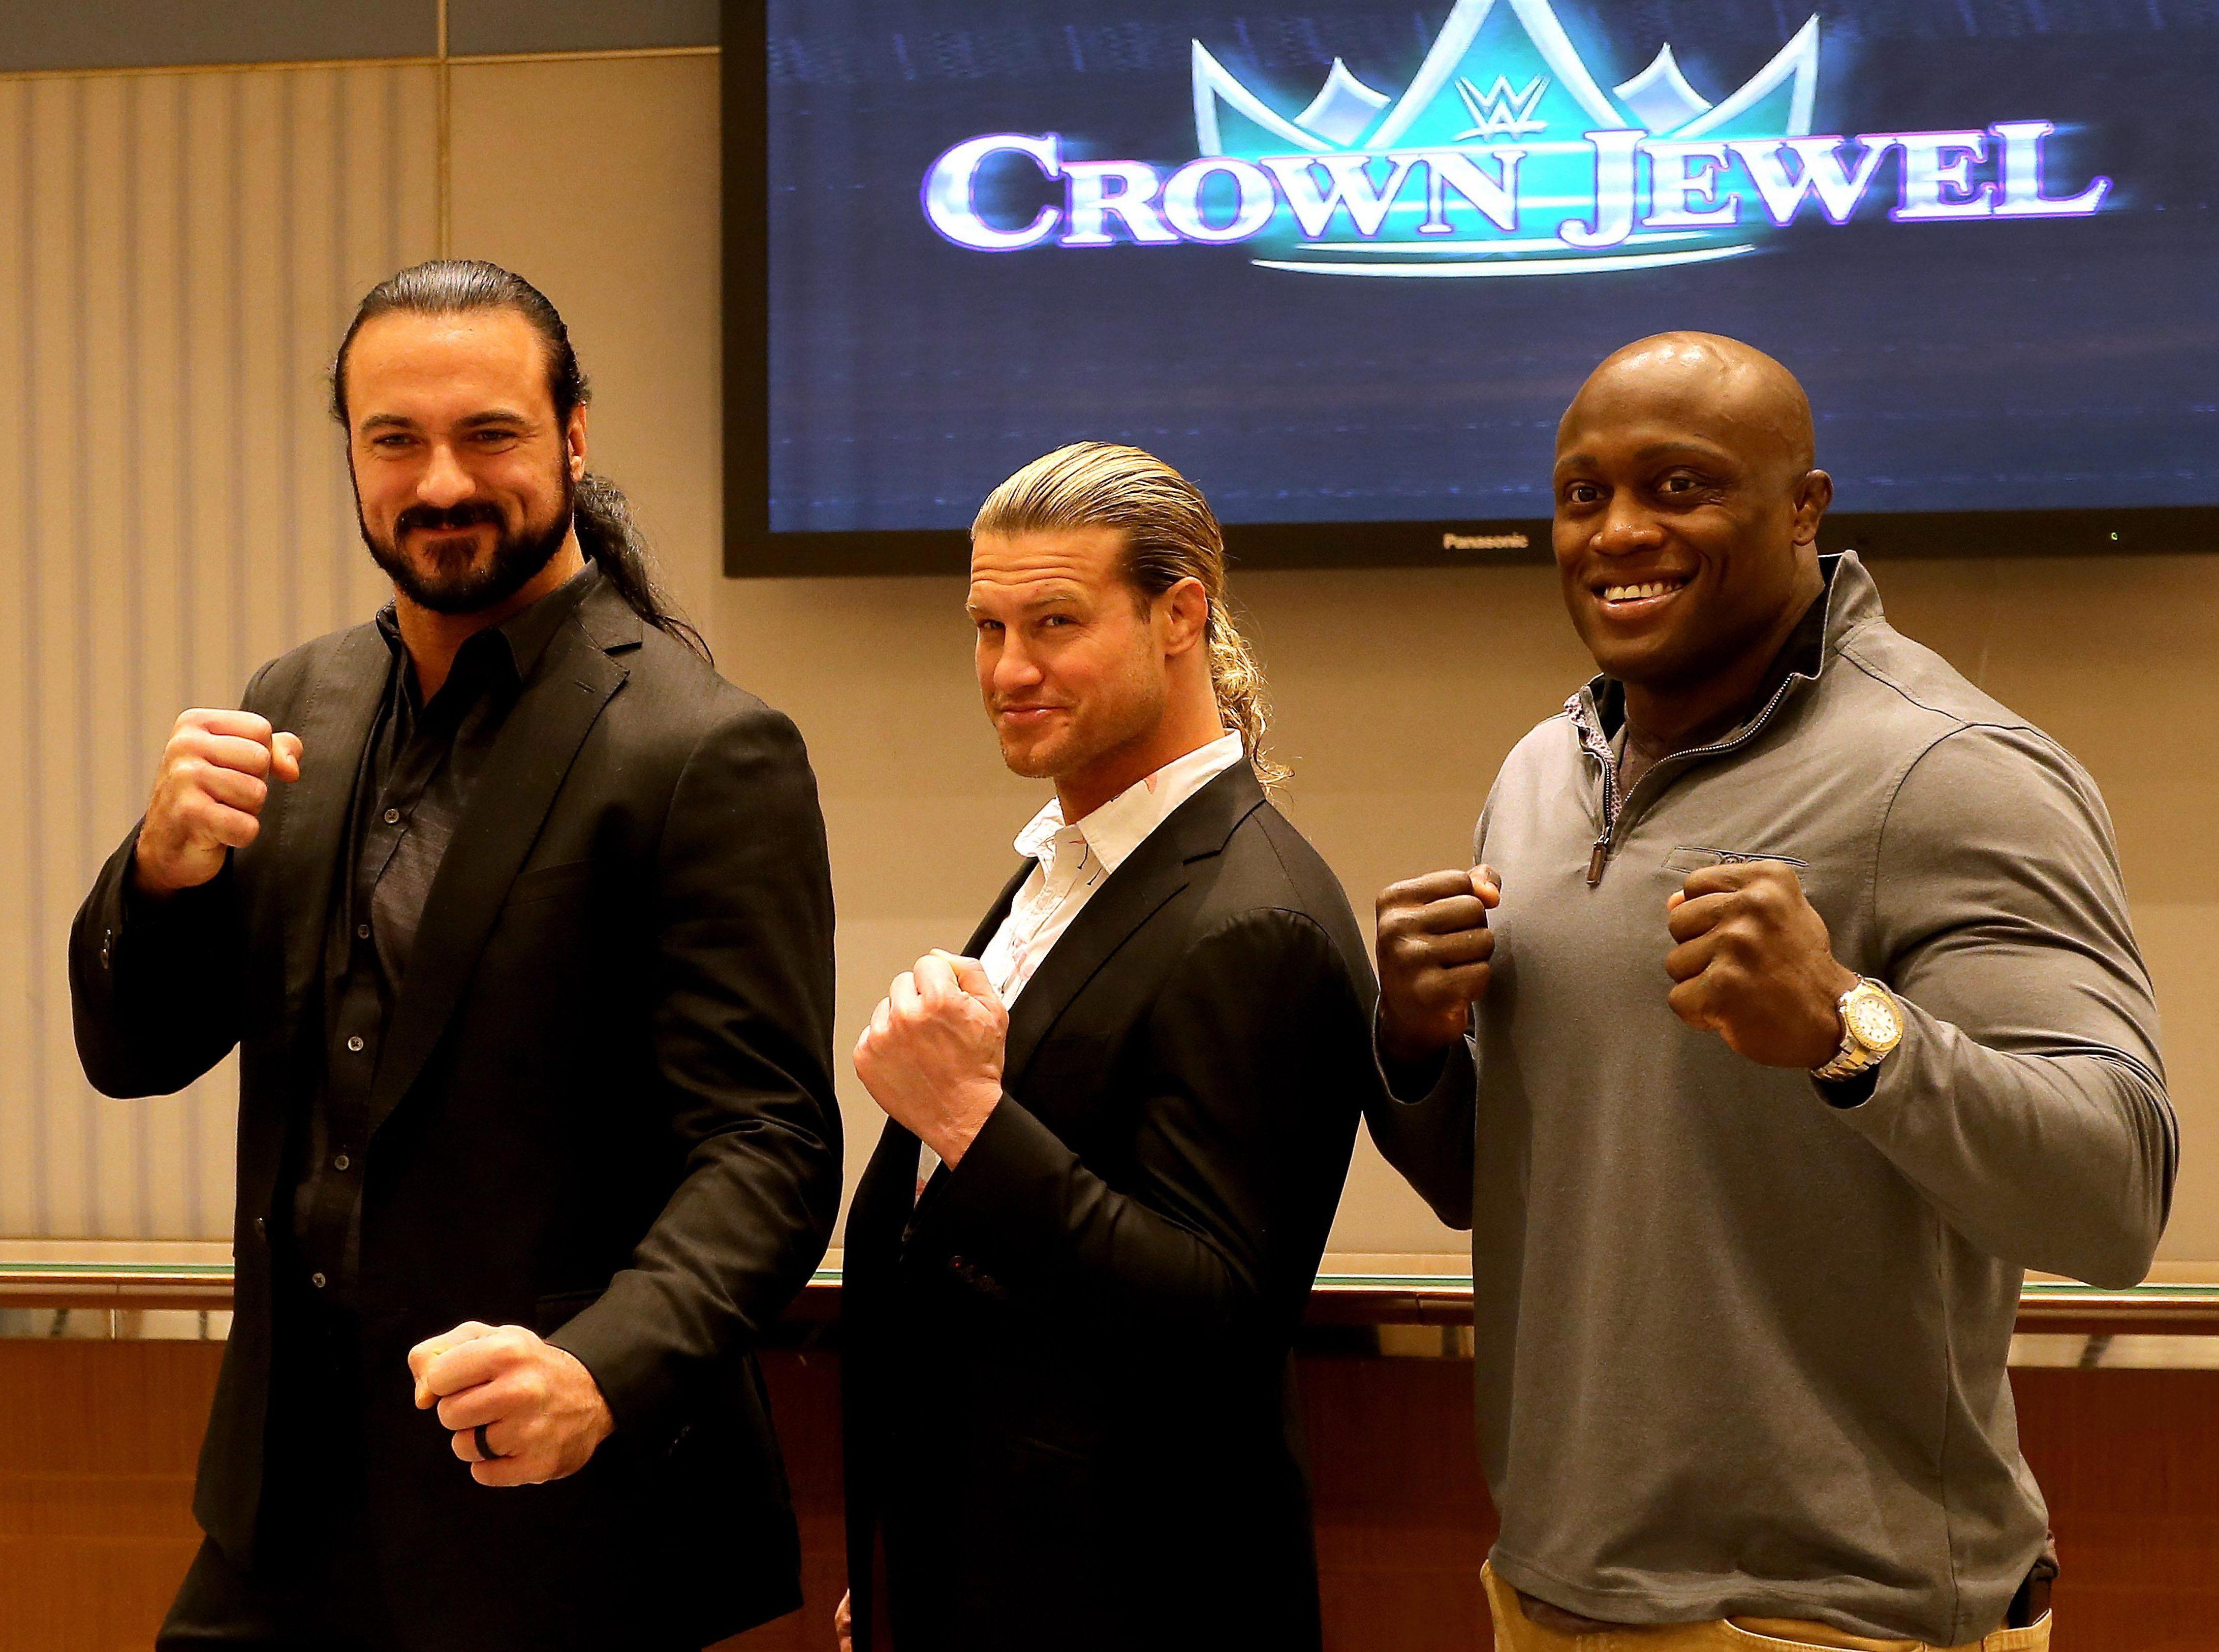 Wrestlers Drew McIntyre, Dolph Ziggler and Bobby Lashley face the camera